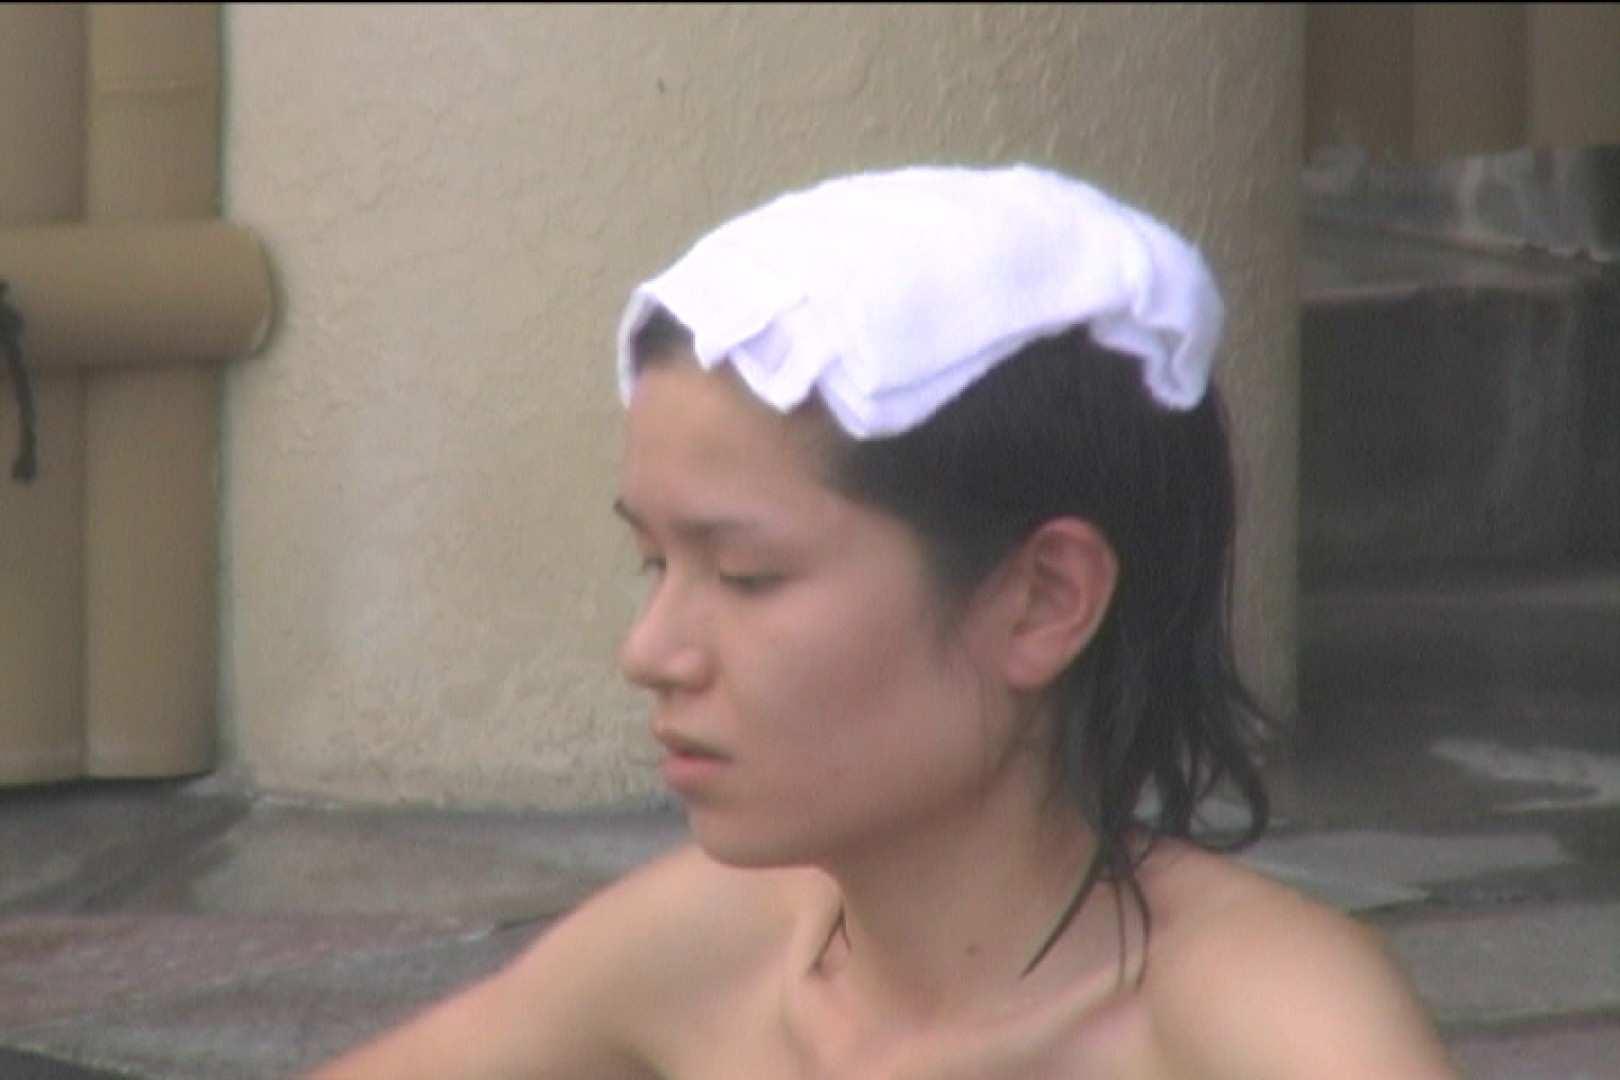 Aquaな露天風呂Vol.530 盗撮 | HなOL  88pic 60